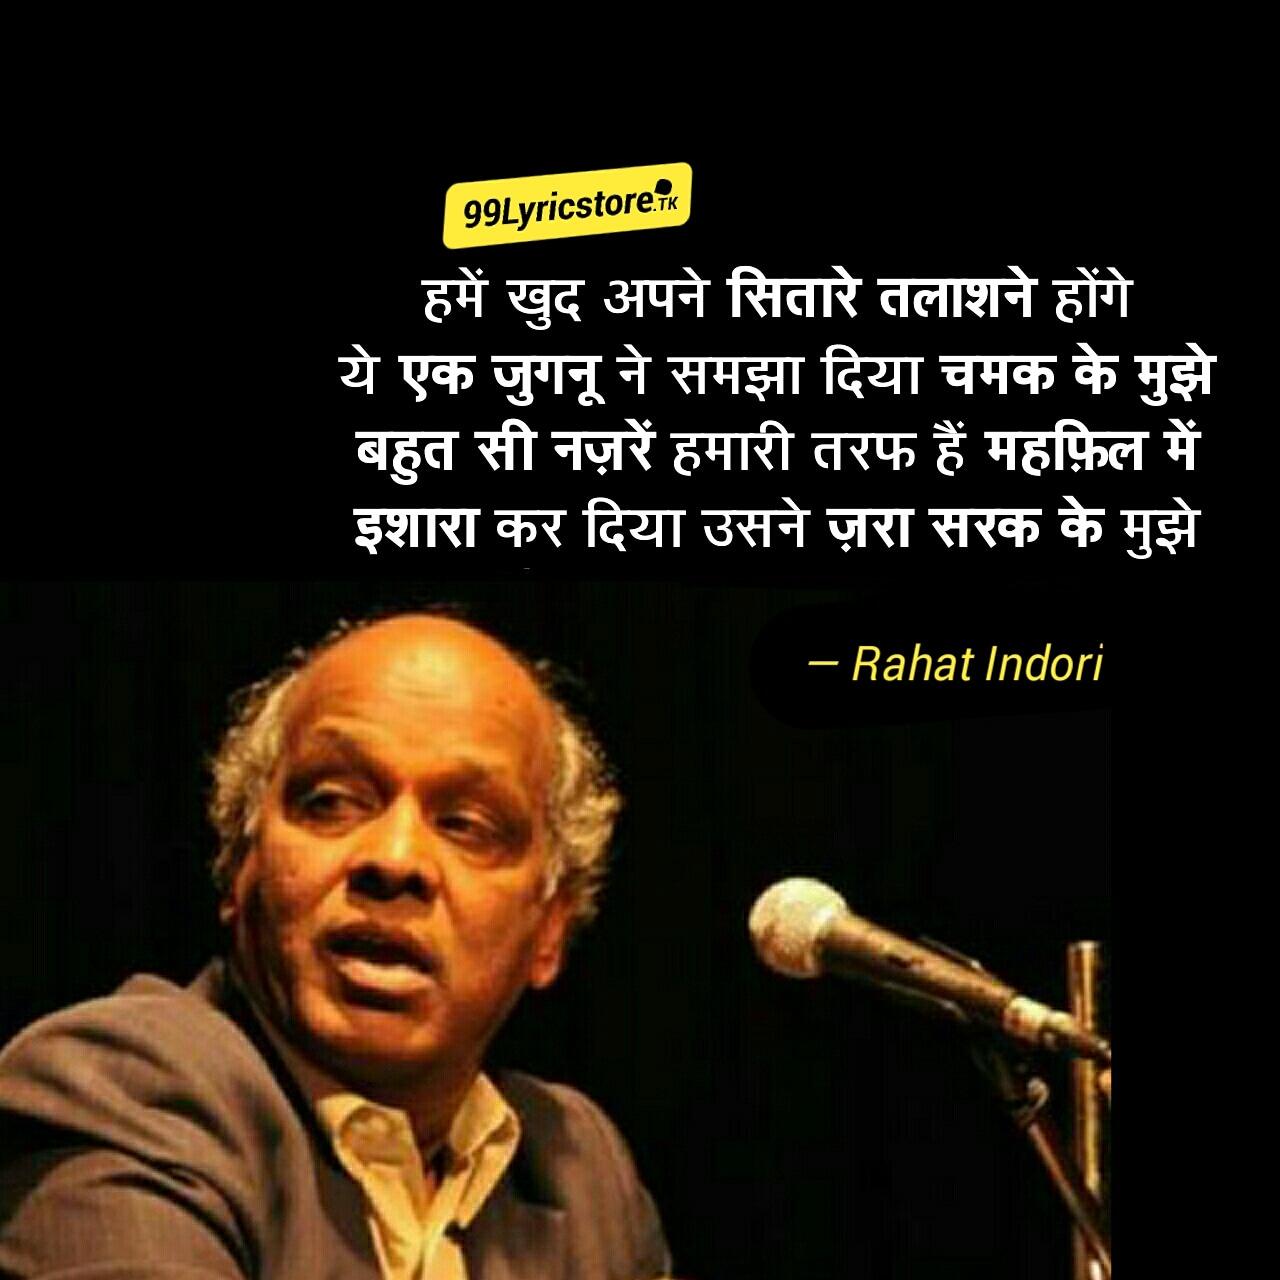 Chuki Thi Ye Duniya Thapak Thapak Ke Mujhe written and performed by Rahat Indori. This poetry is best Ghazal and Shayari of Rahat Indori.